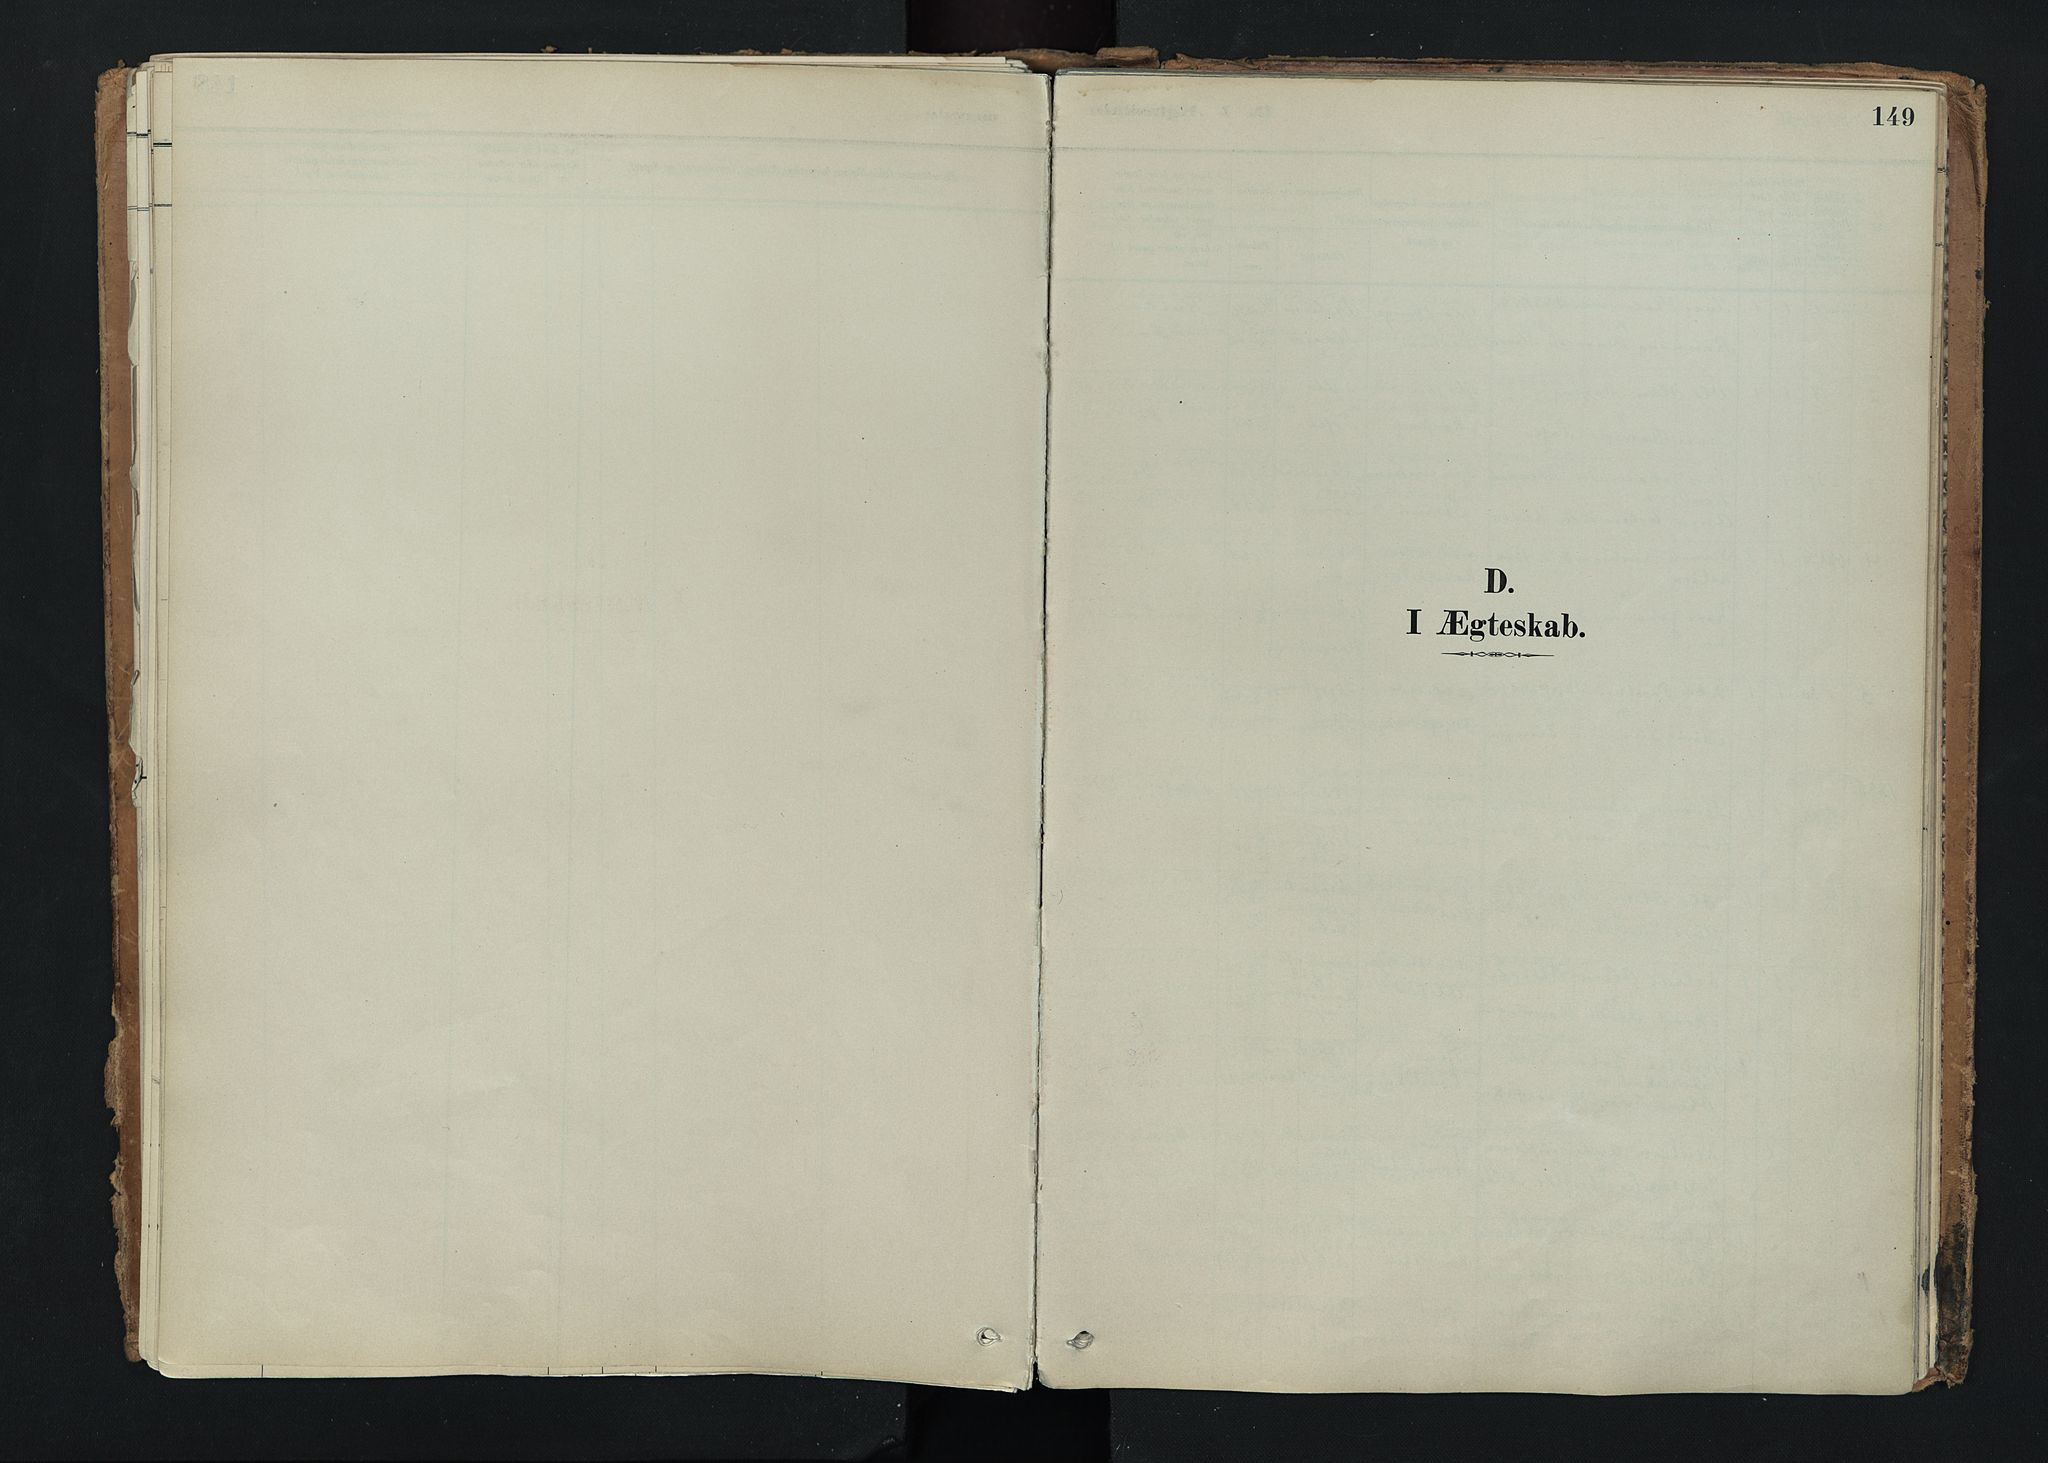 SAH, Nord-Fron prestekontor, Ministerialbok nr. 5, 1884-1914, s. 149